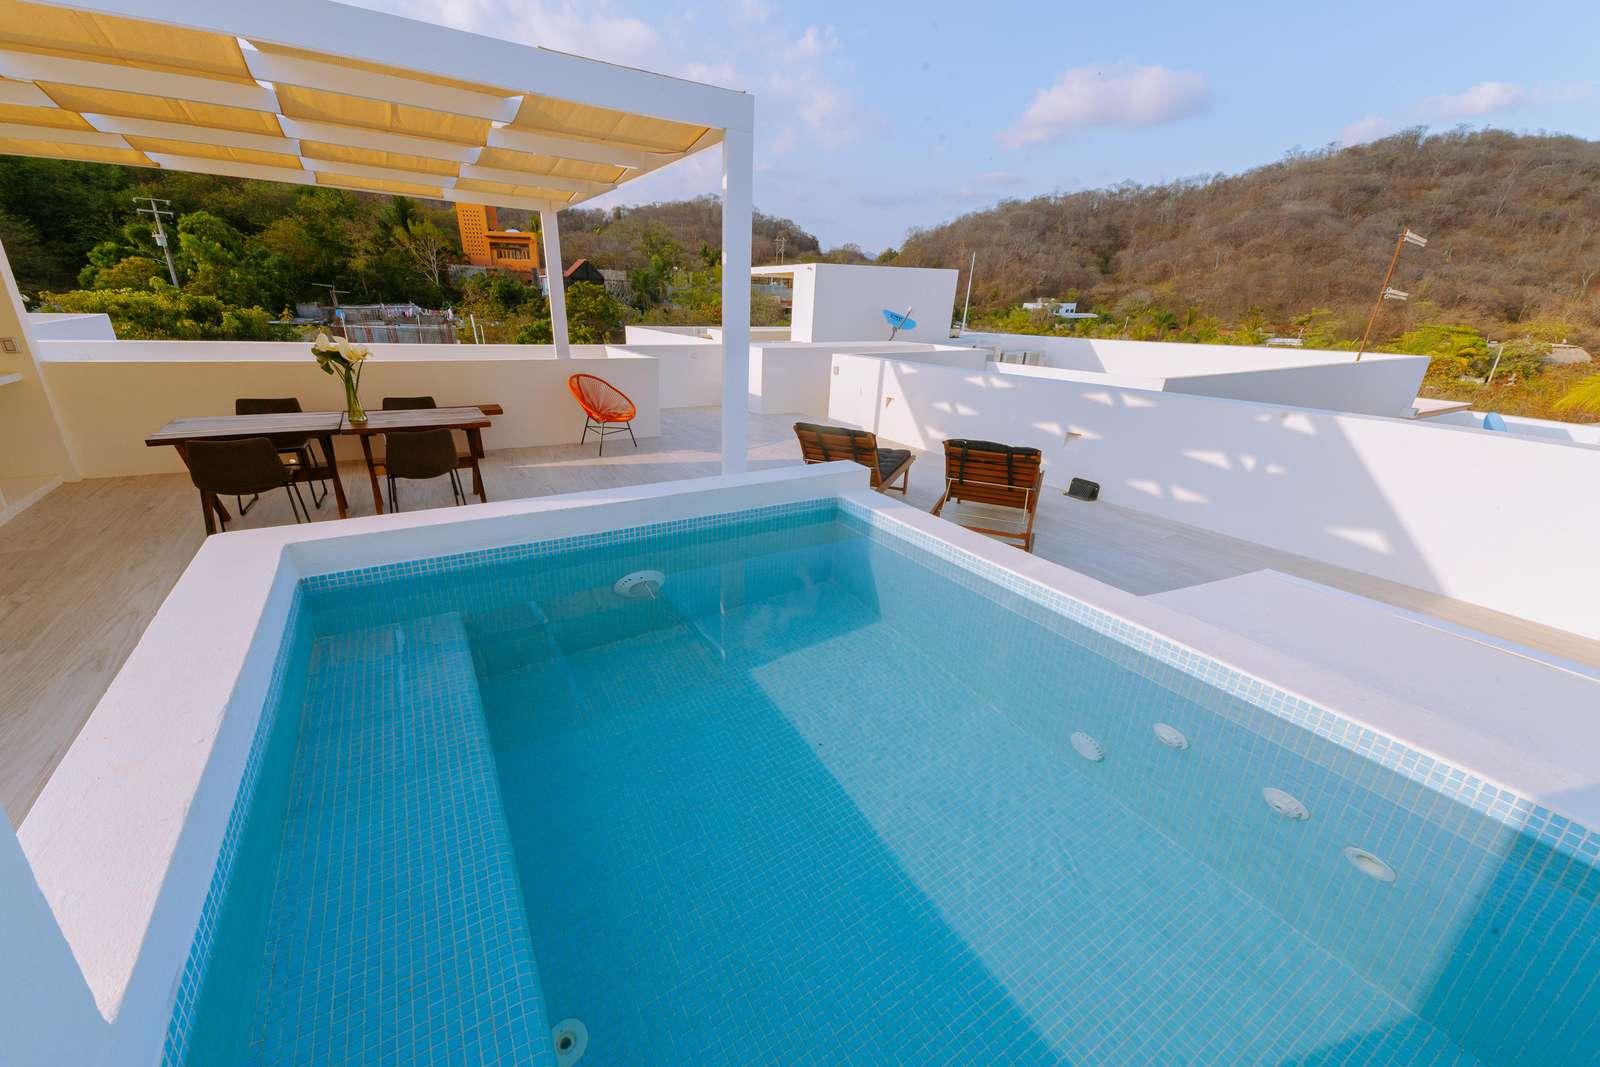 79014 – Bocana Beach Condos - property